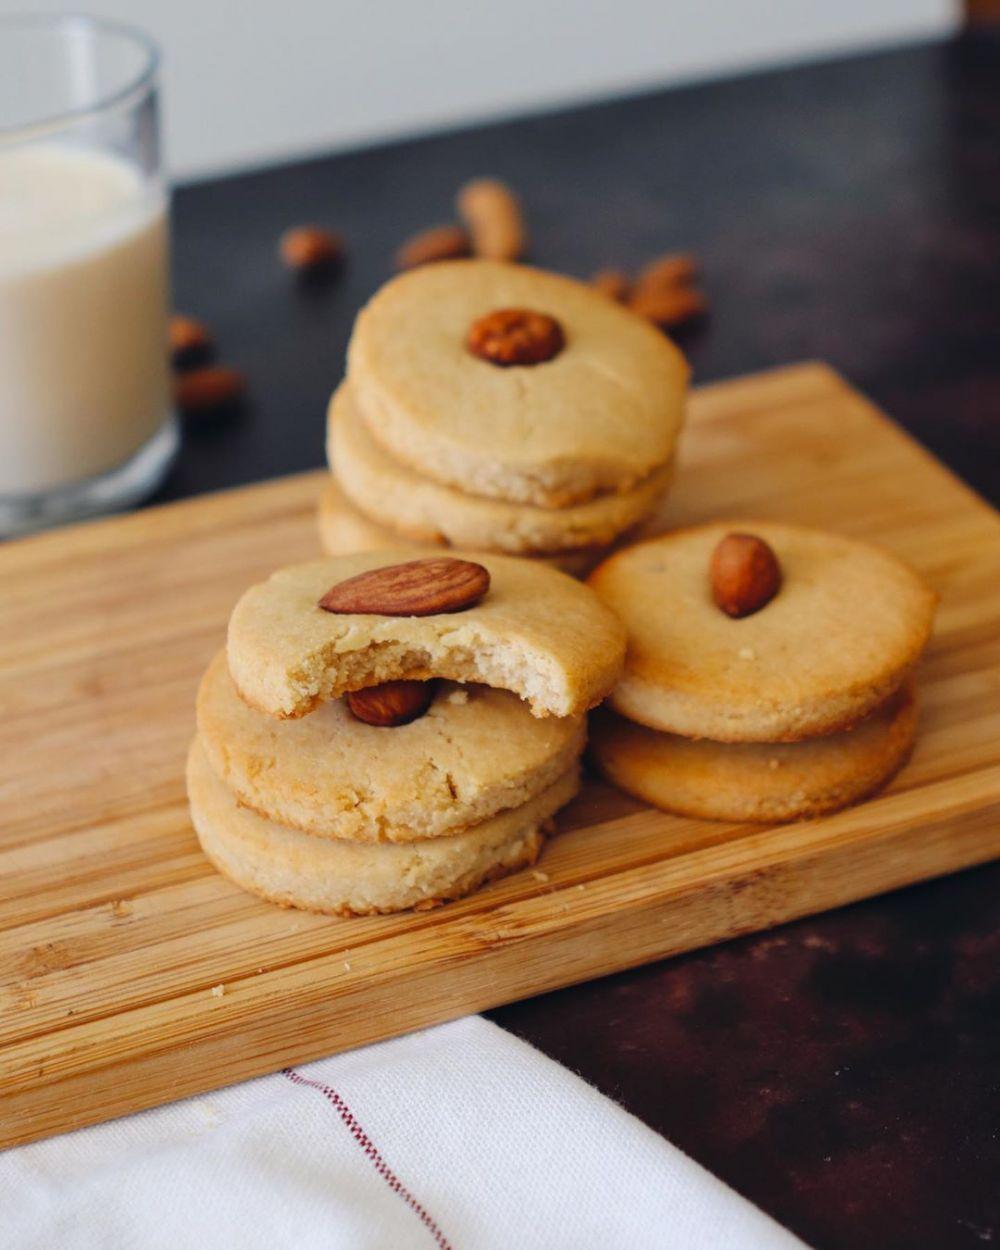 Resep Cookies Almond C 2020 Brilio Net Di 2020 Resep Roti Cemilan Resep